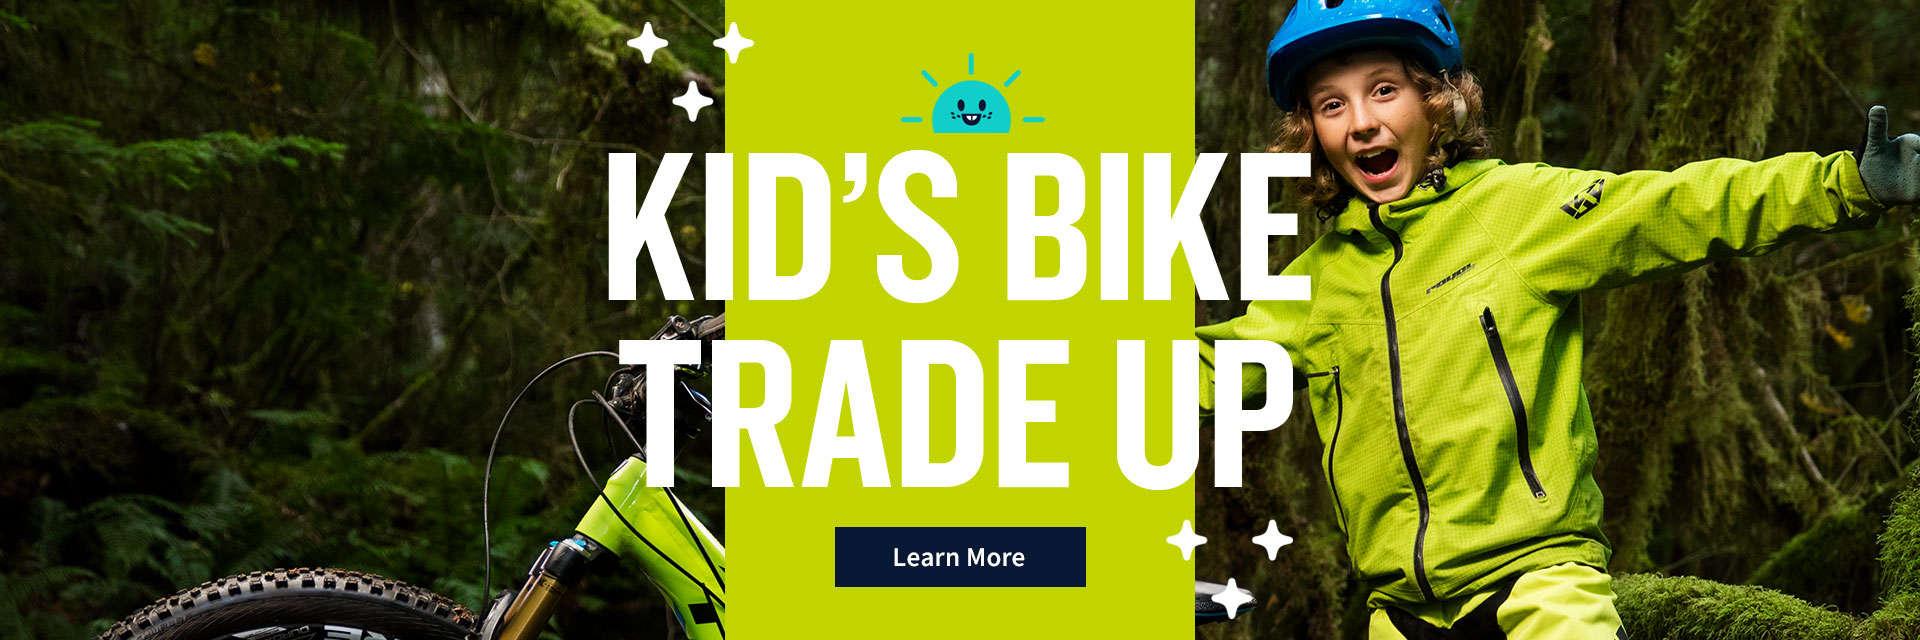 Kid's Bike Trade Up